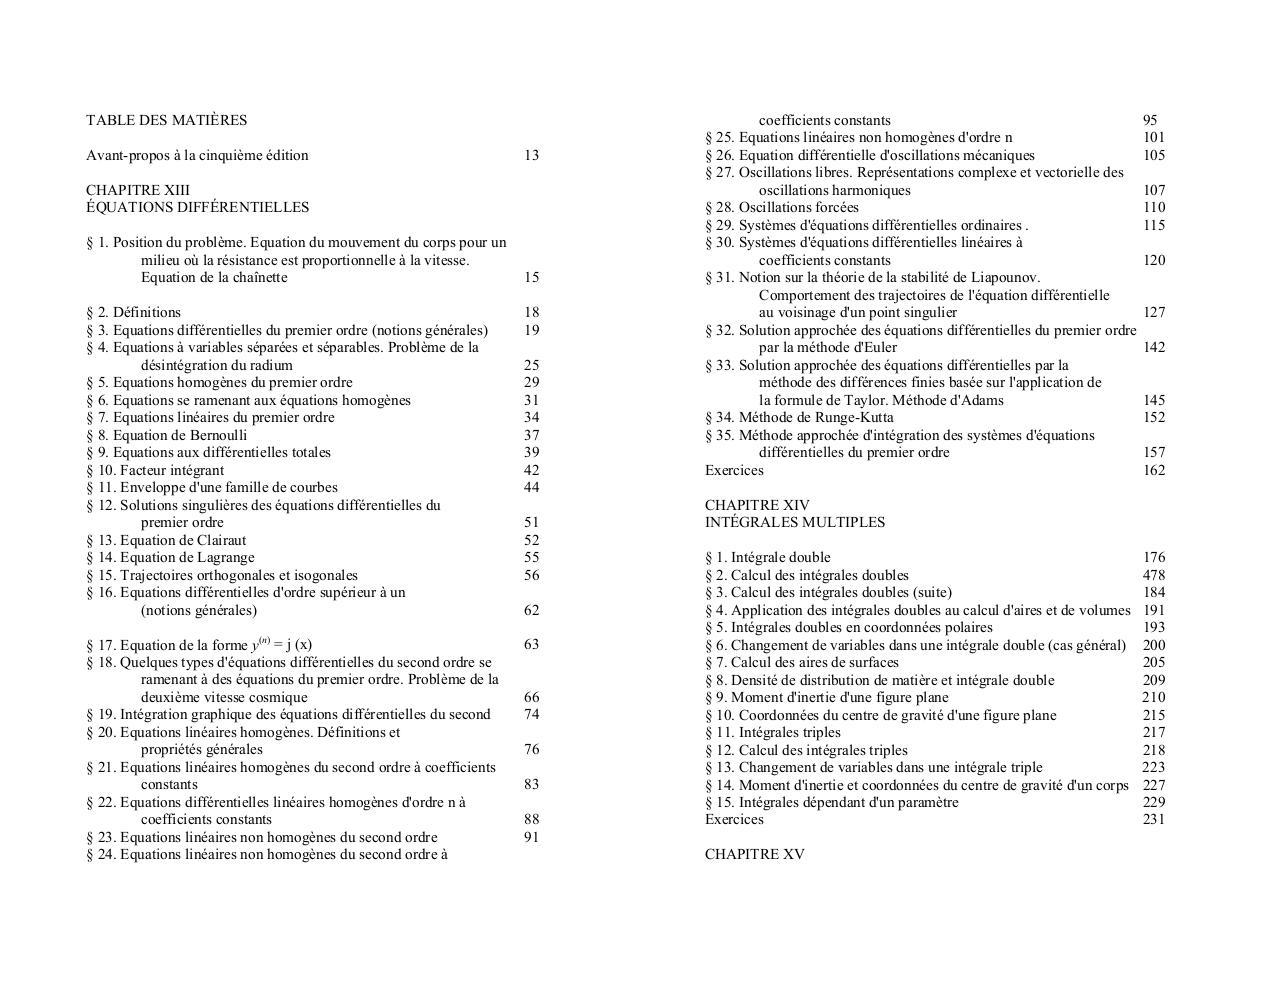 piskounov tome 1 pdf